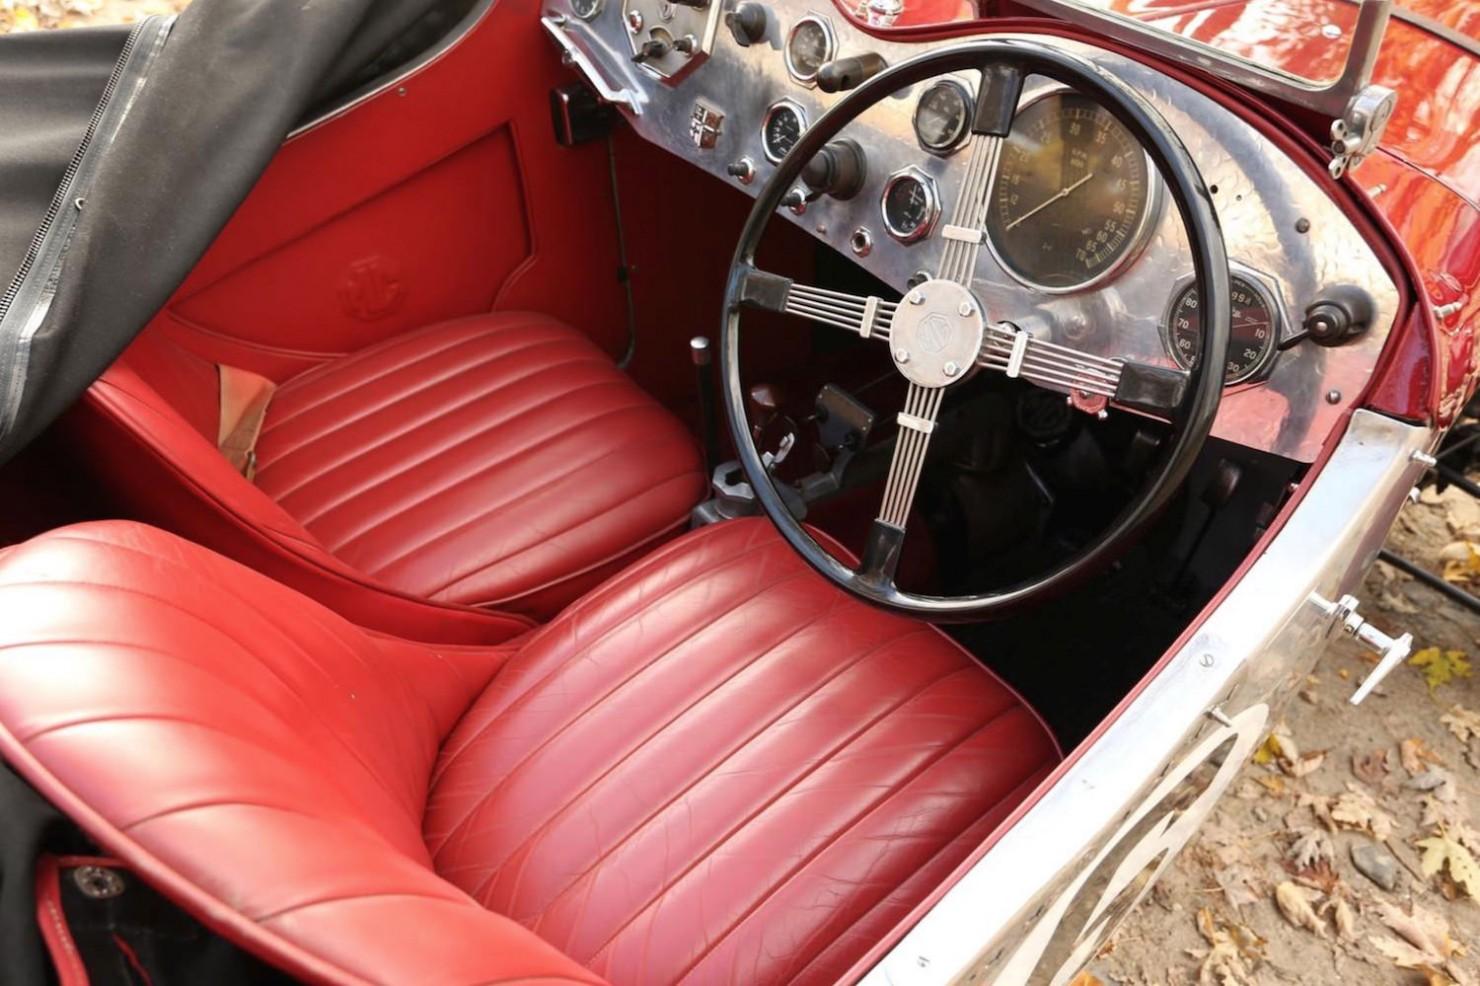 Vintage-MG-Racing-Car-14